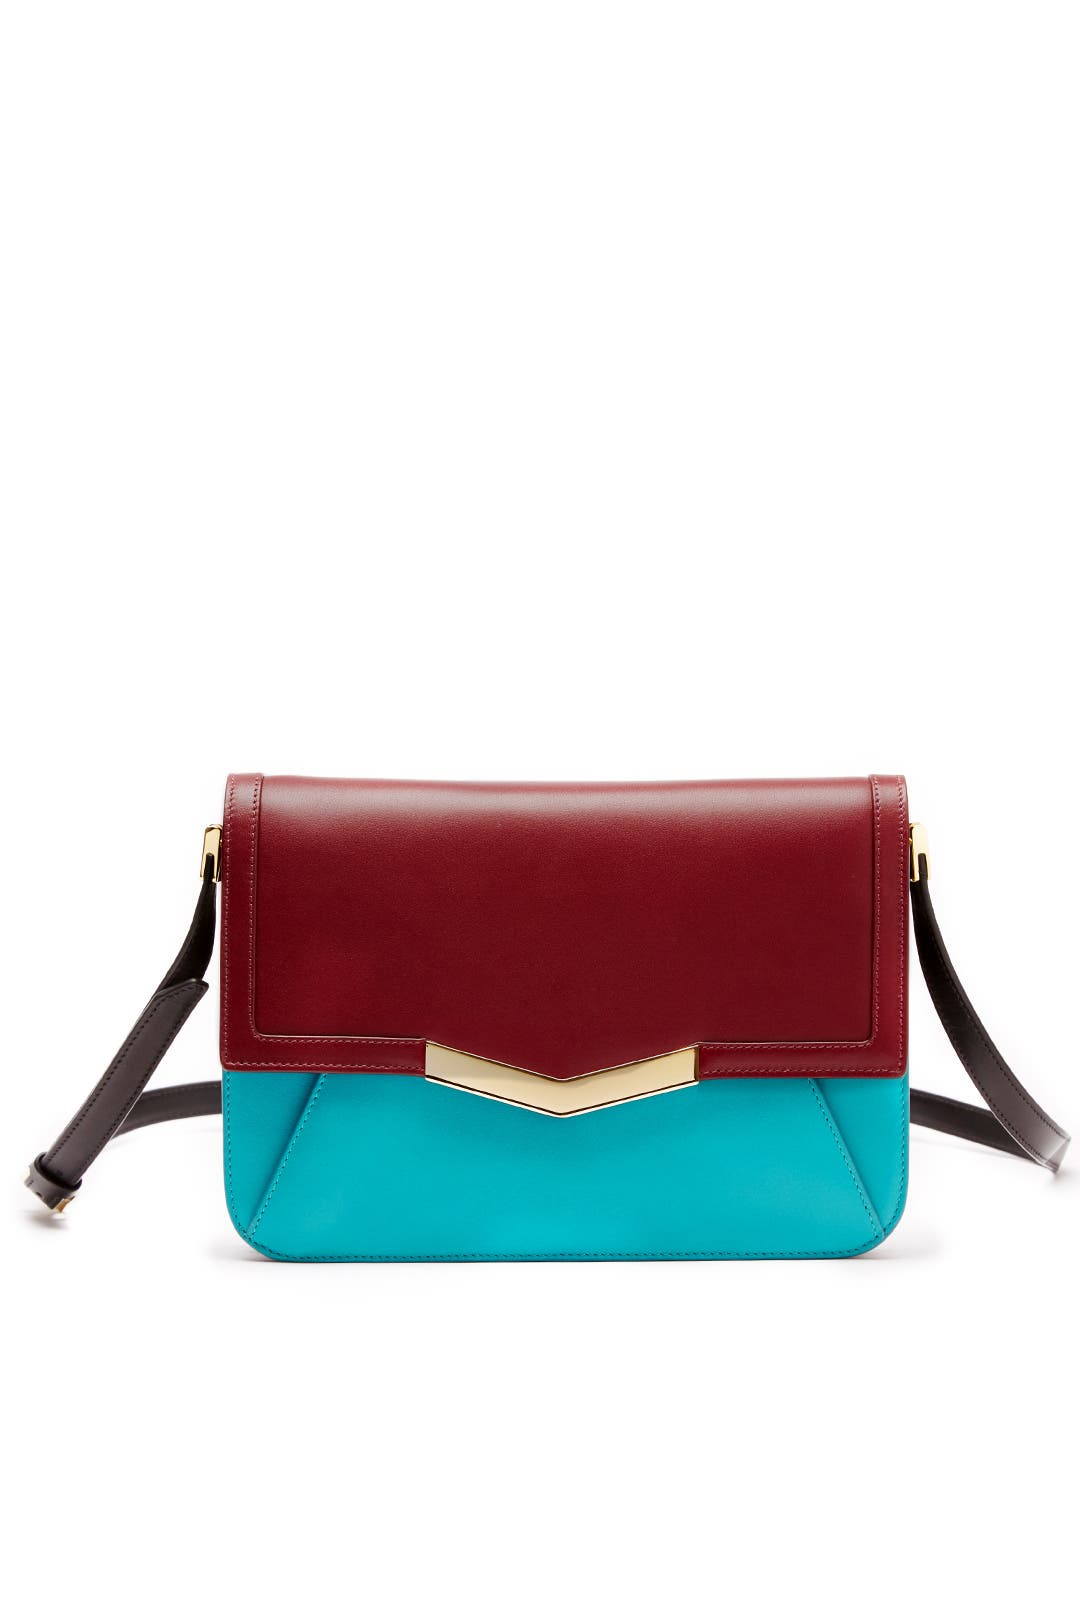 Carmine Affine Bag by Times Arrow